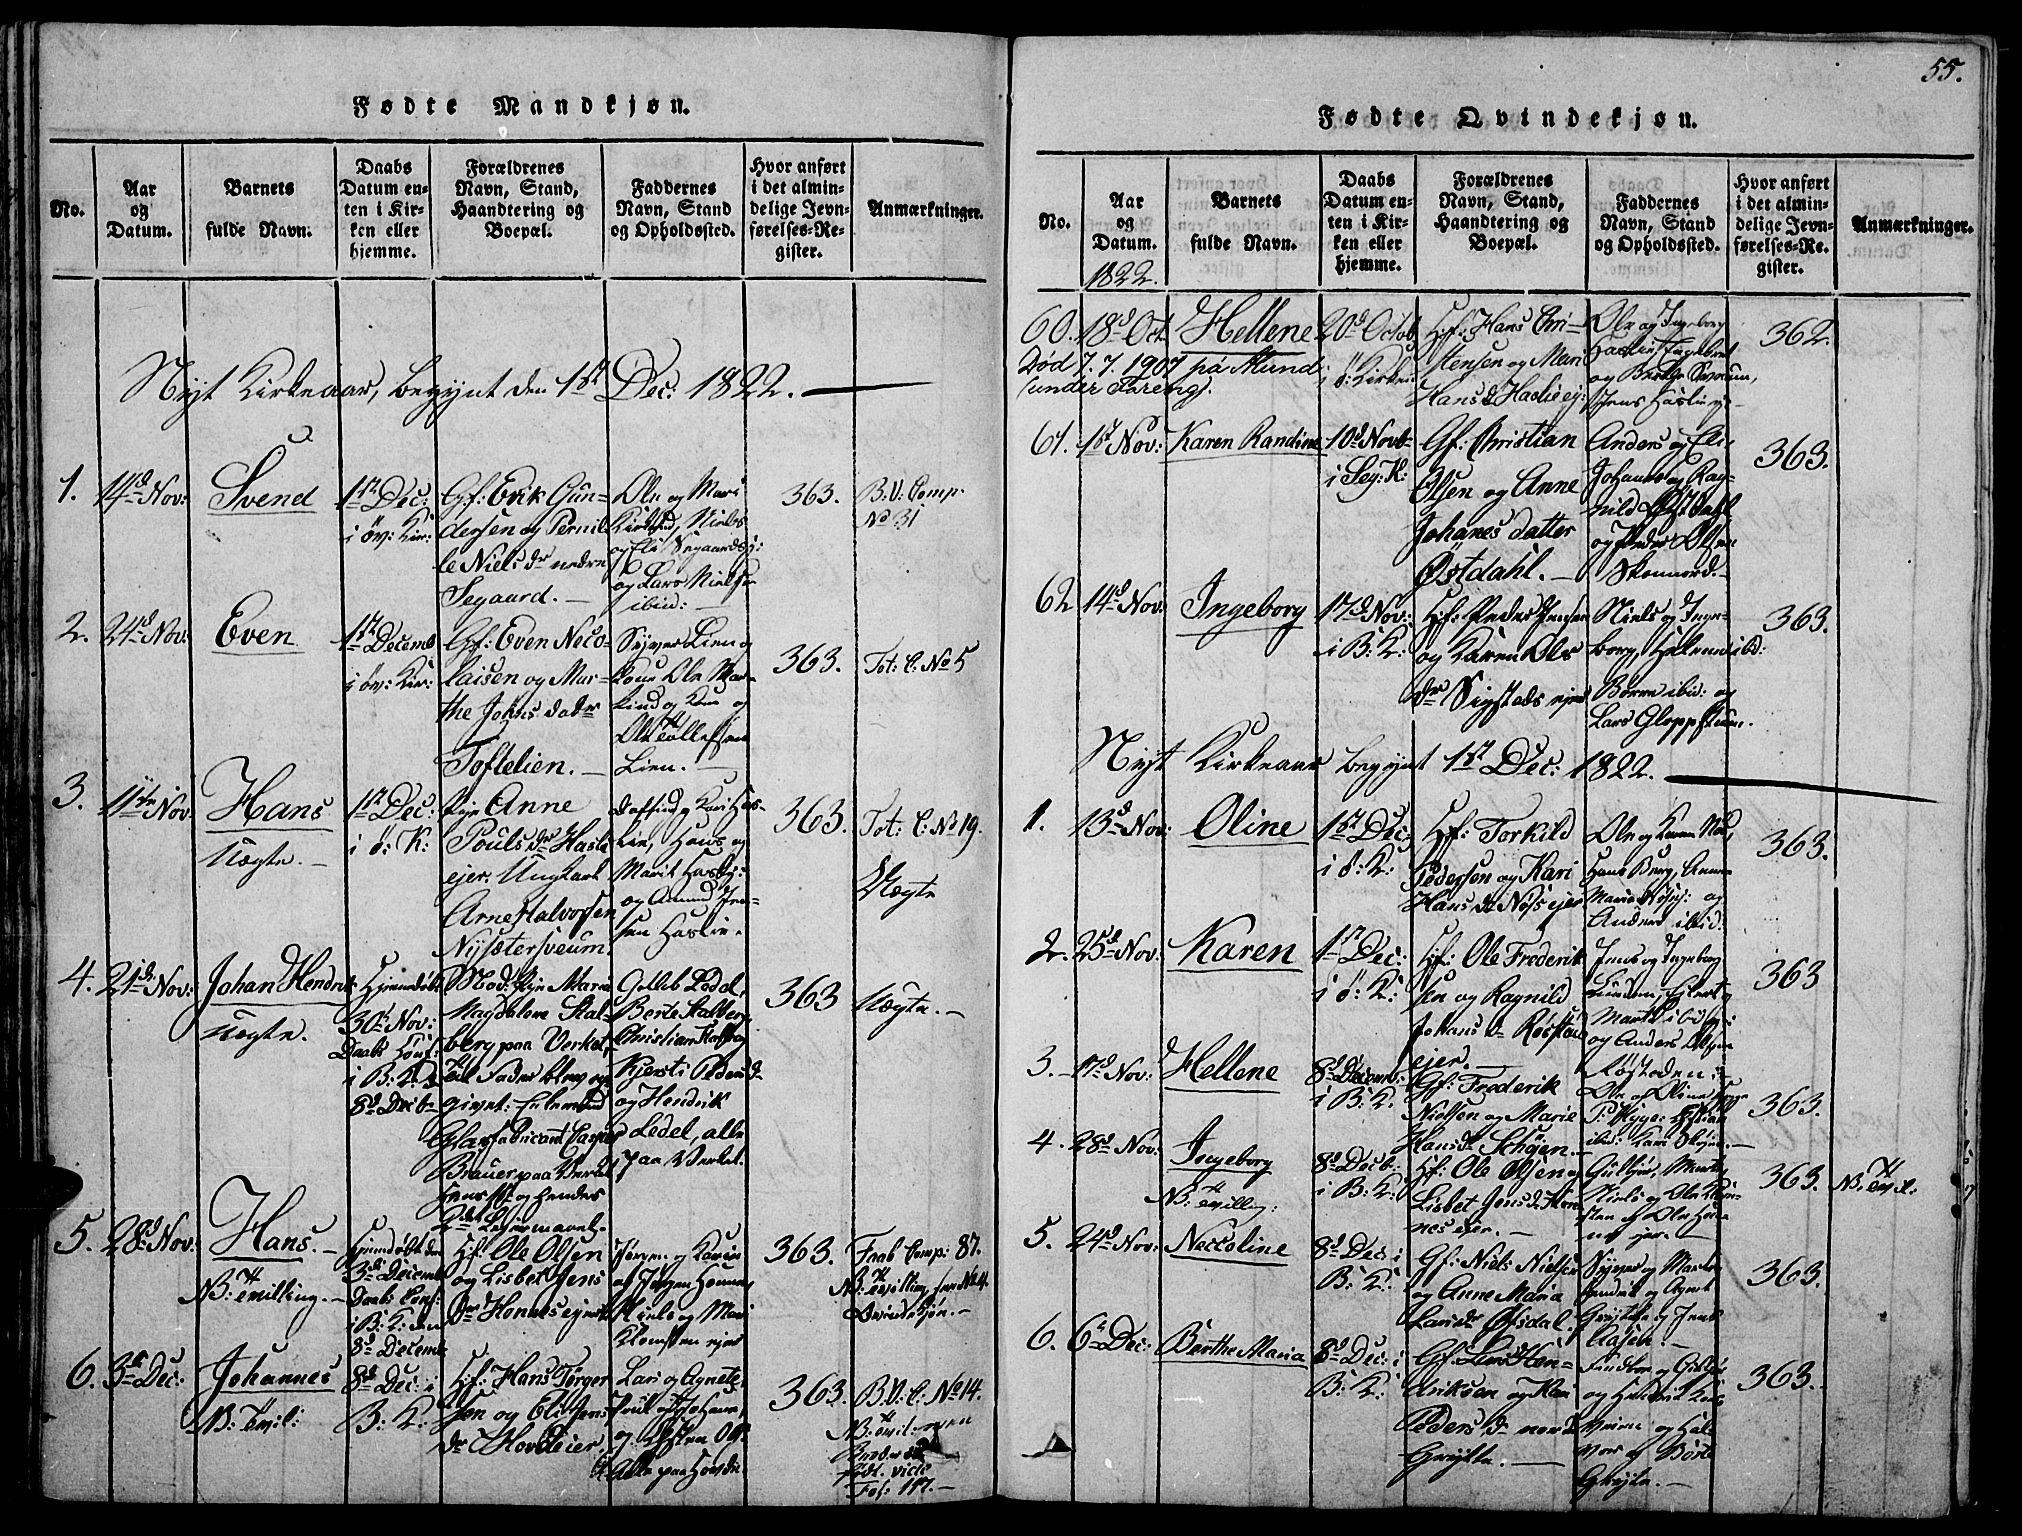 SAH, Biri prestekontor, Ministerialbok nr. 3, 1814-1828, s. 55